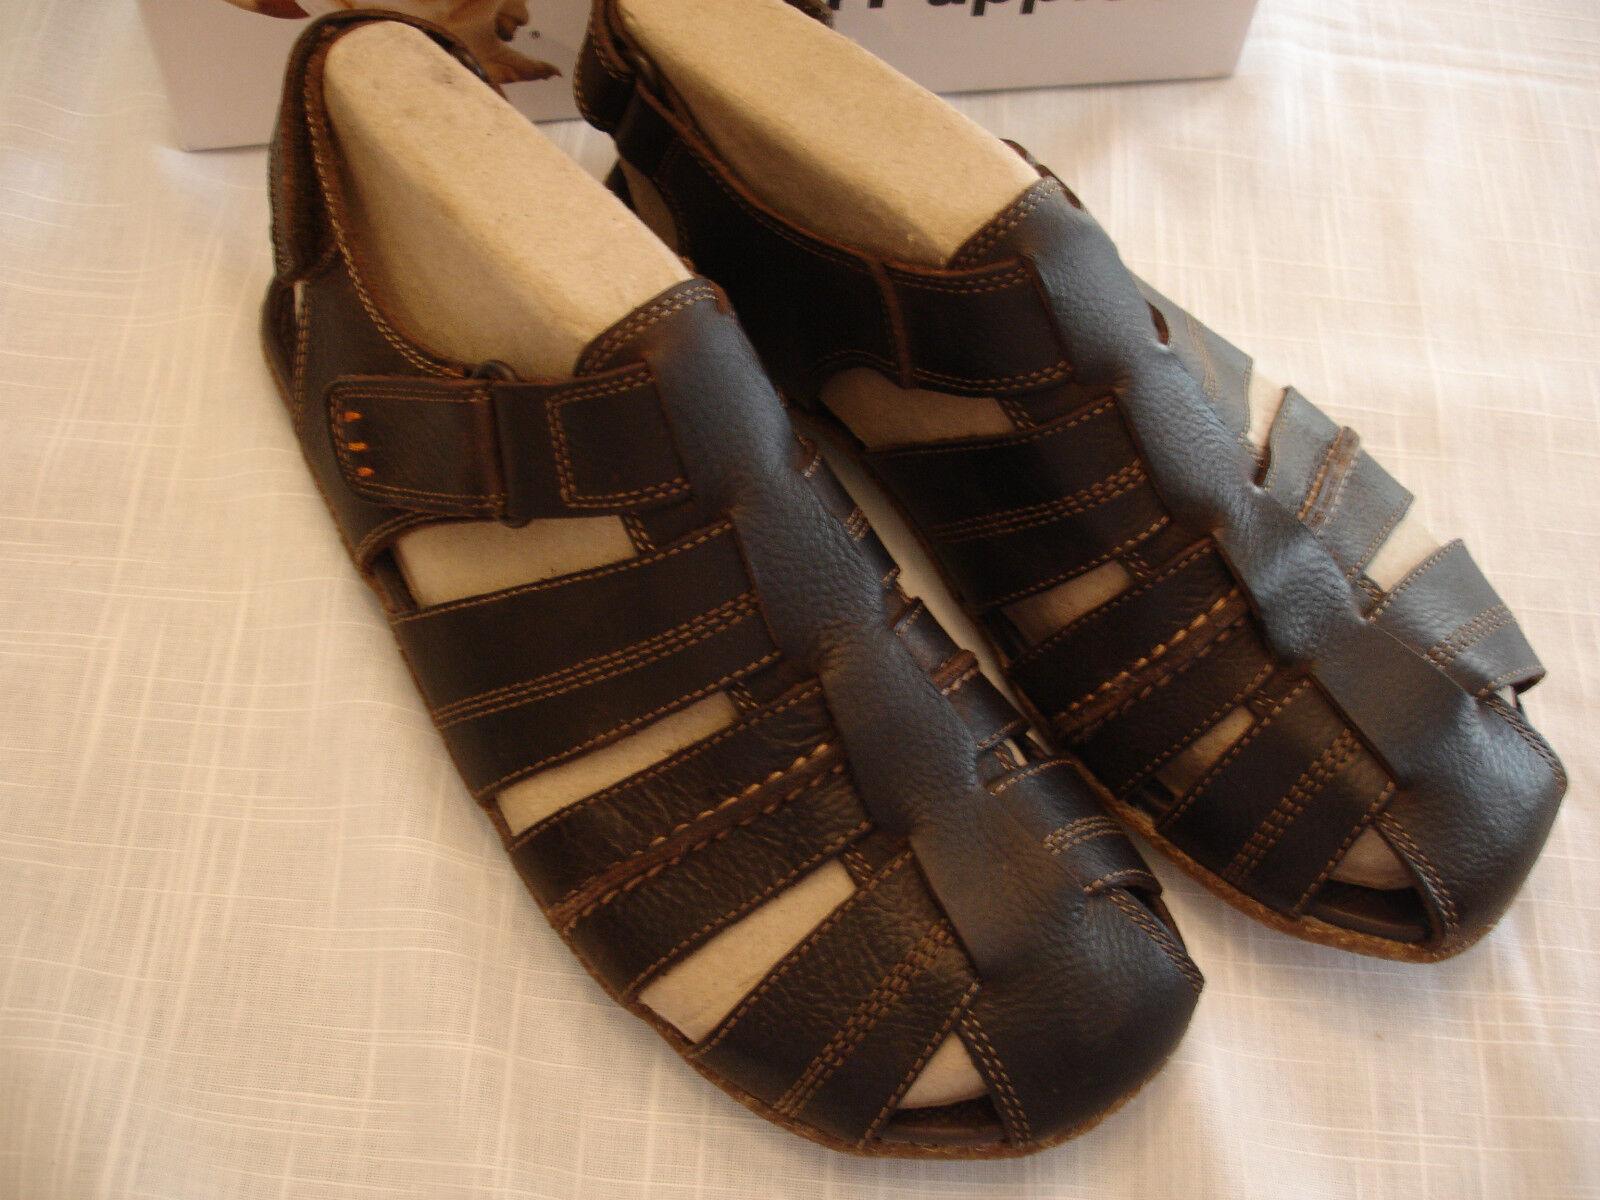 HUSH PUPPIES Brown Pelle Fisherman Sandals Shoes Uomo Sz 10 M NIB